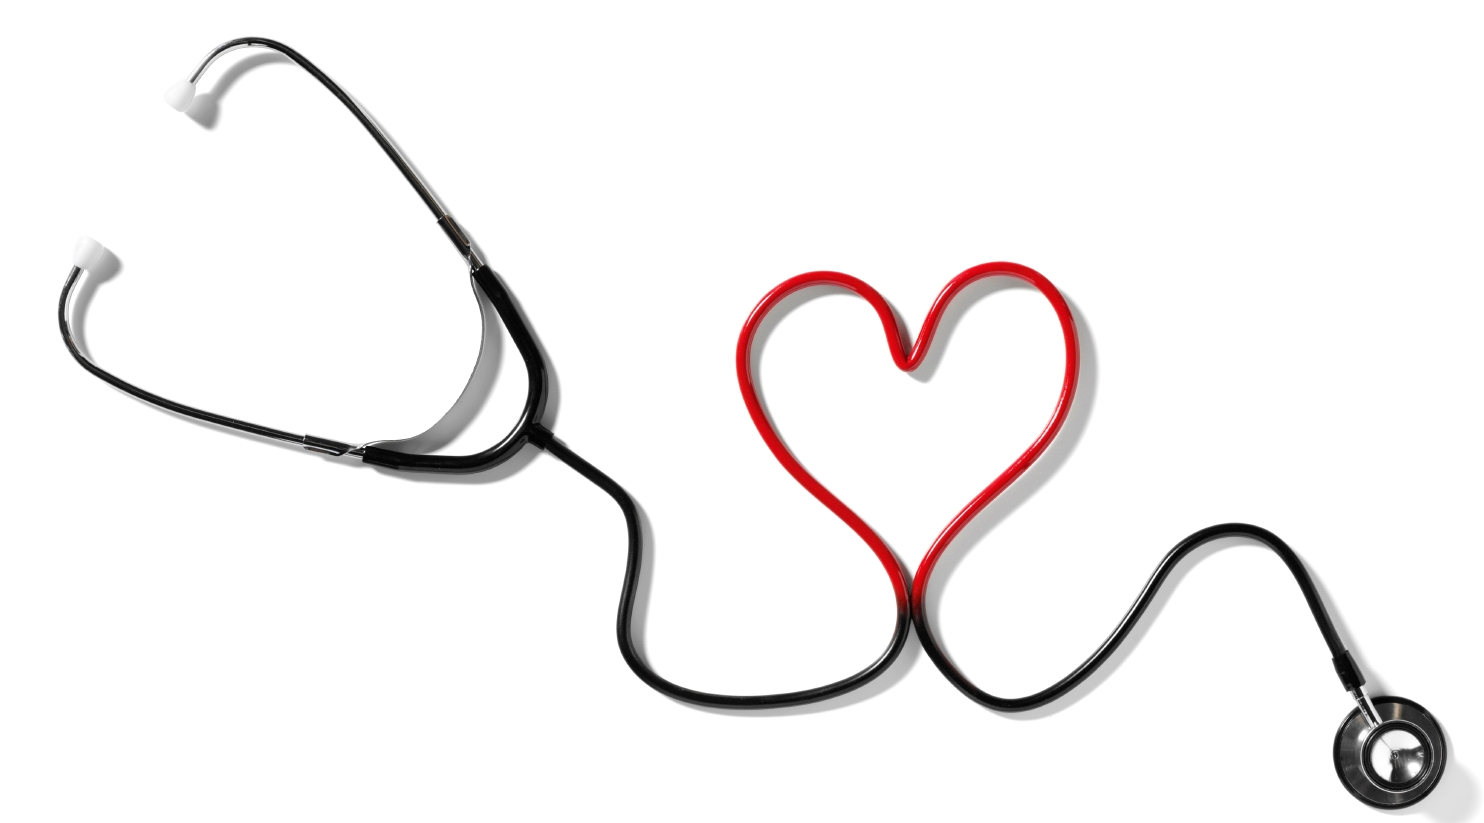 Stethoscope heart clipart 3.